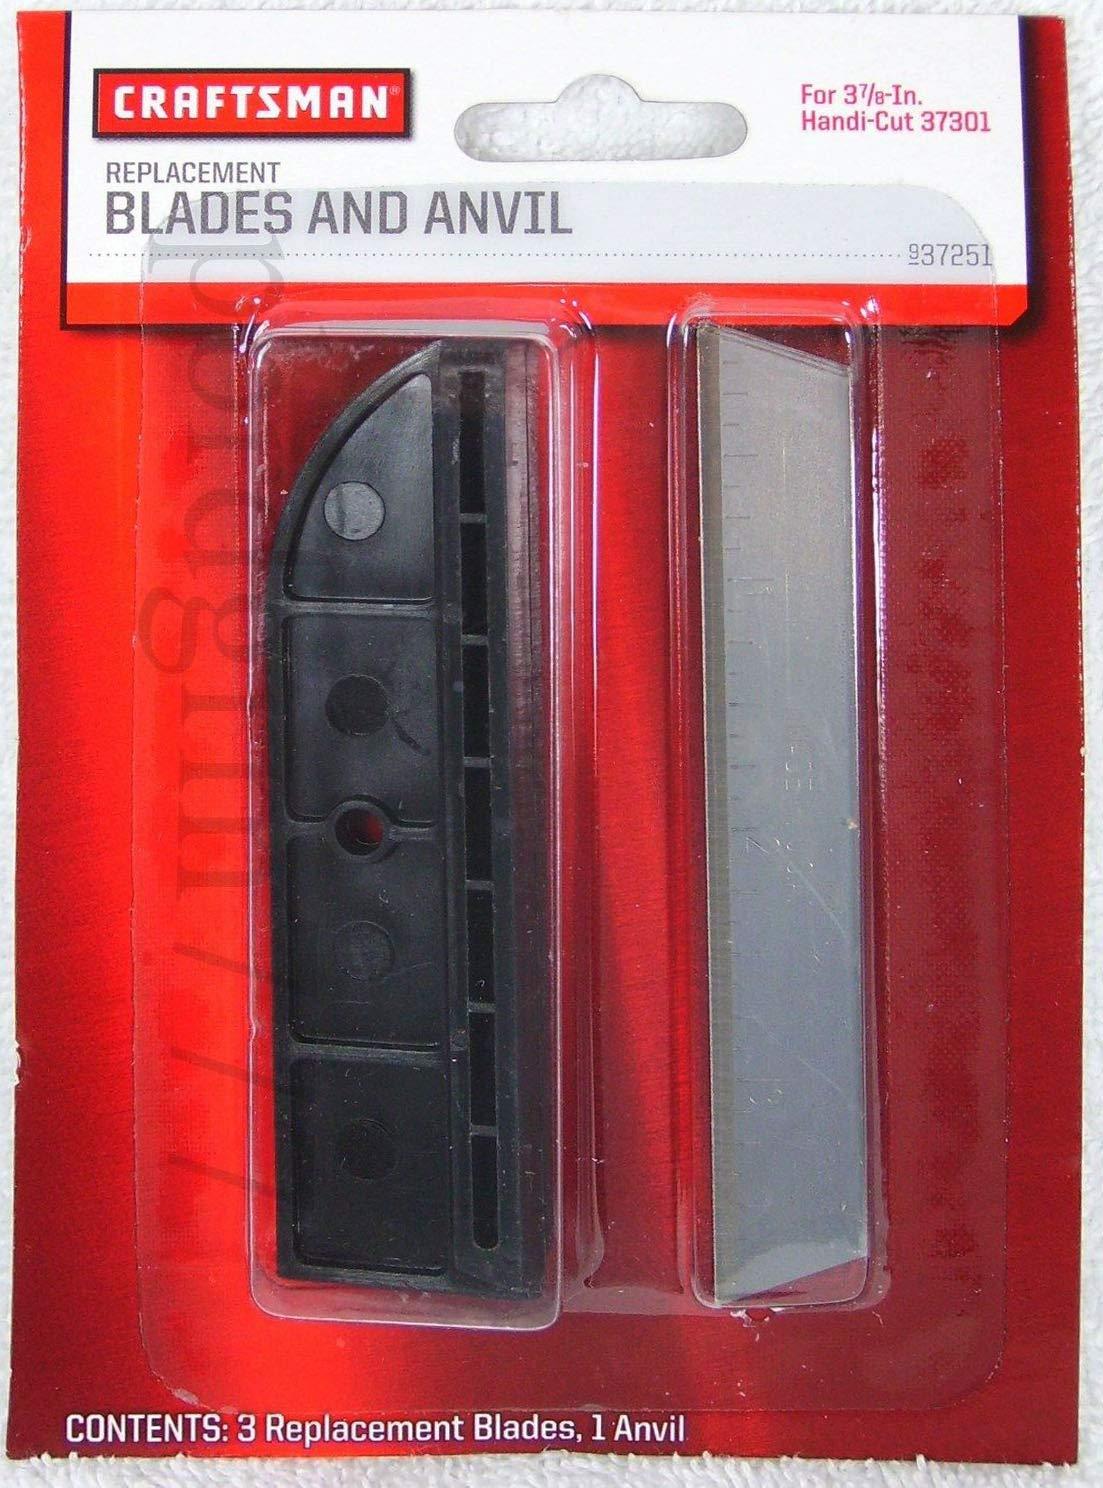 3 7/8`` Craftsman Handi-Cut (3) Blades & (1) Anvil 37301 & 37201 9-37251 New OEM __#pbrdgrm777 by Craftsman